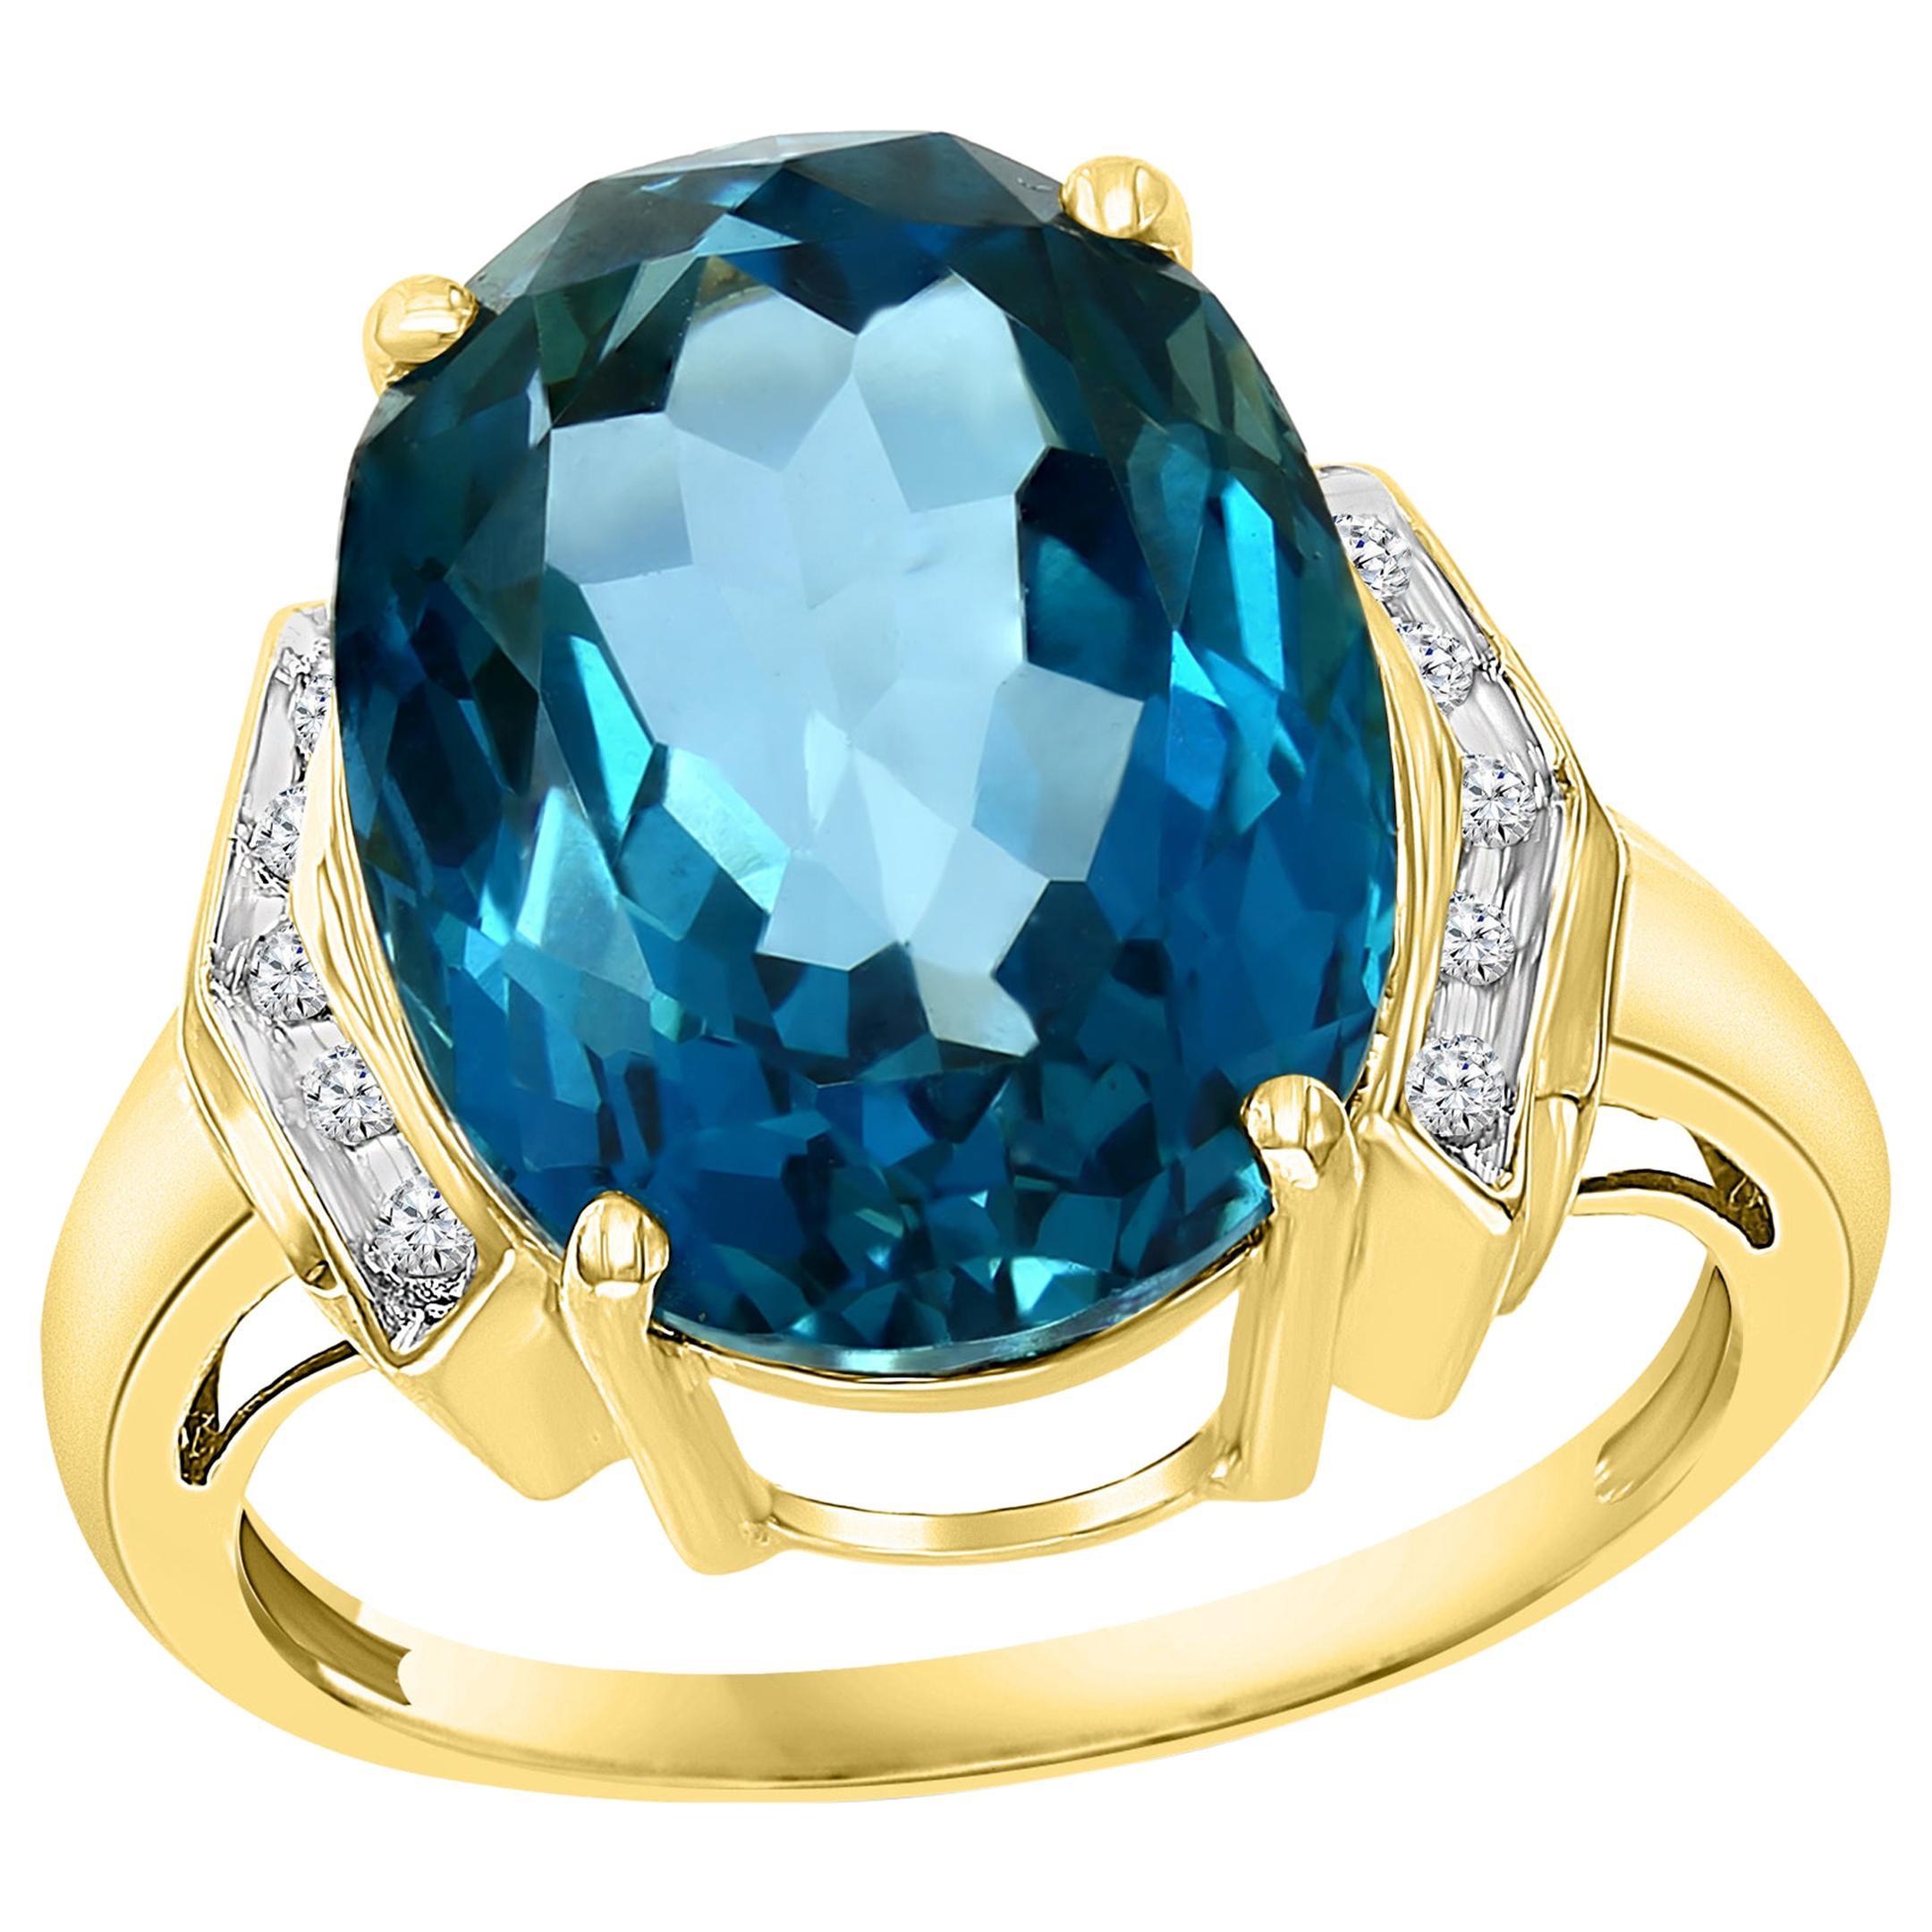 7 Carat Natural Blue Topaz and Diamond Cocktail Ring 14 Karat Yellow Gold Estate